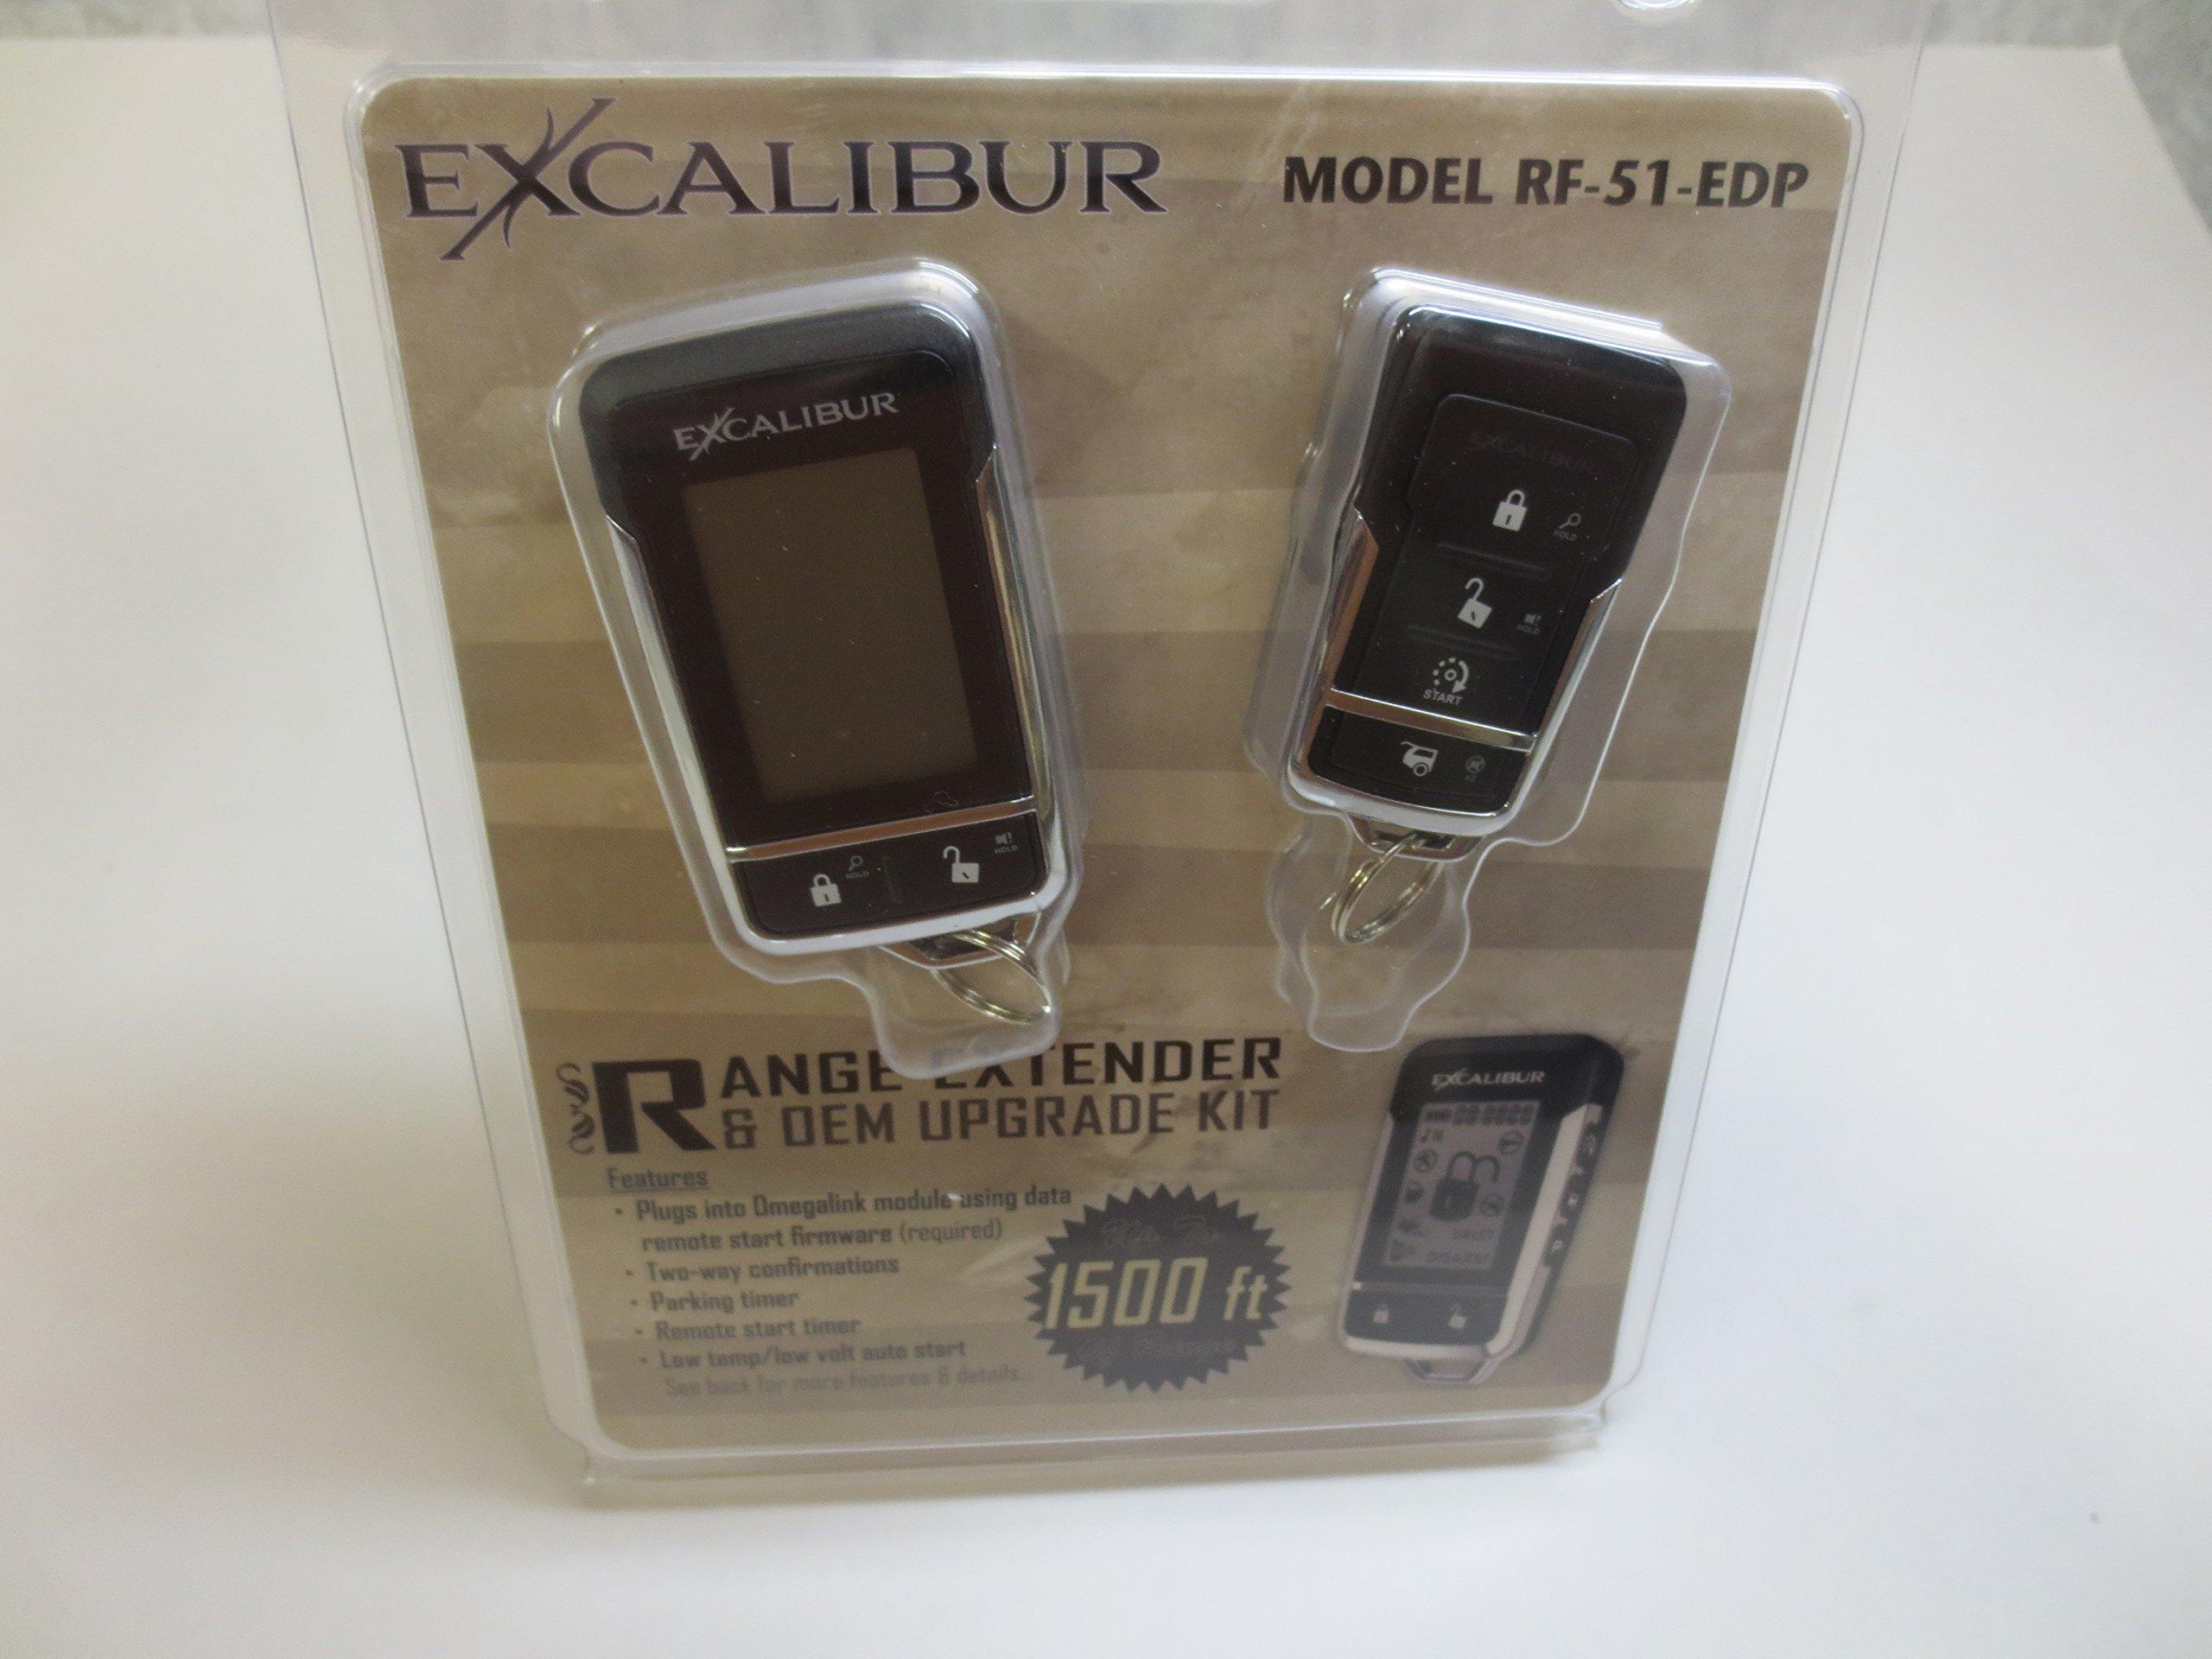 Excalibur RF-51-EDP for: Remote Start T Harness RS Series Extended Range RF Kit